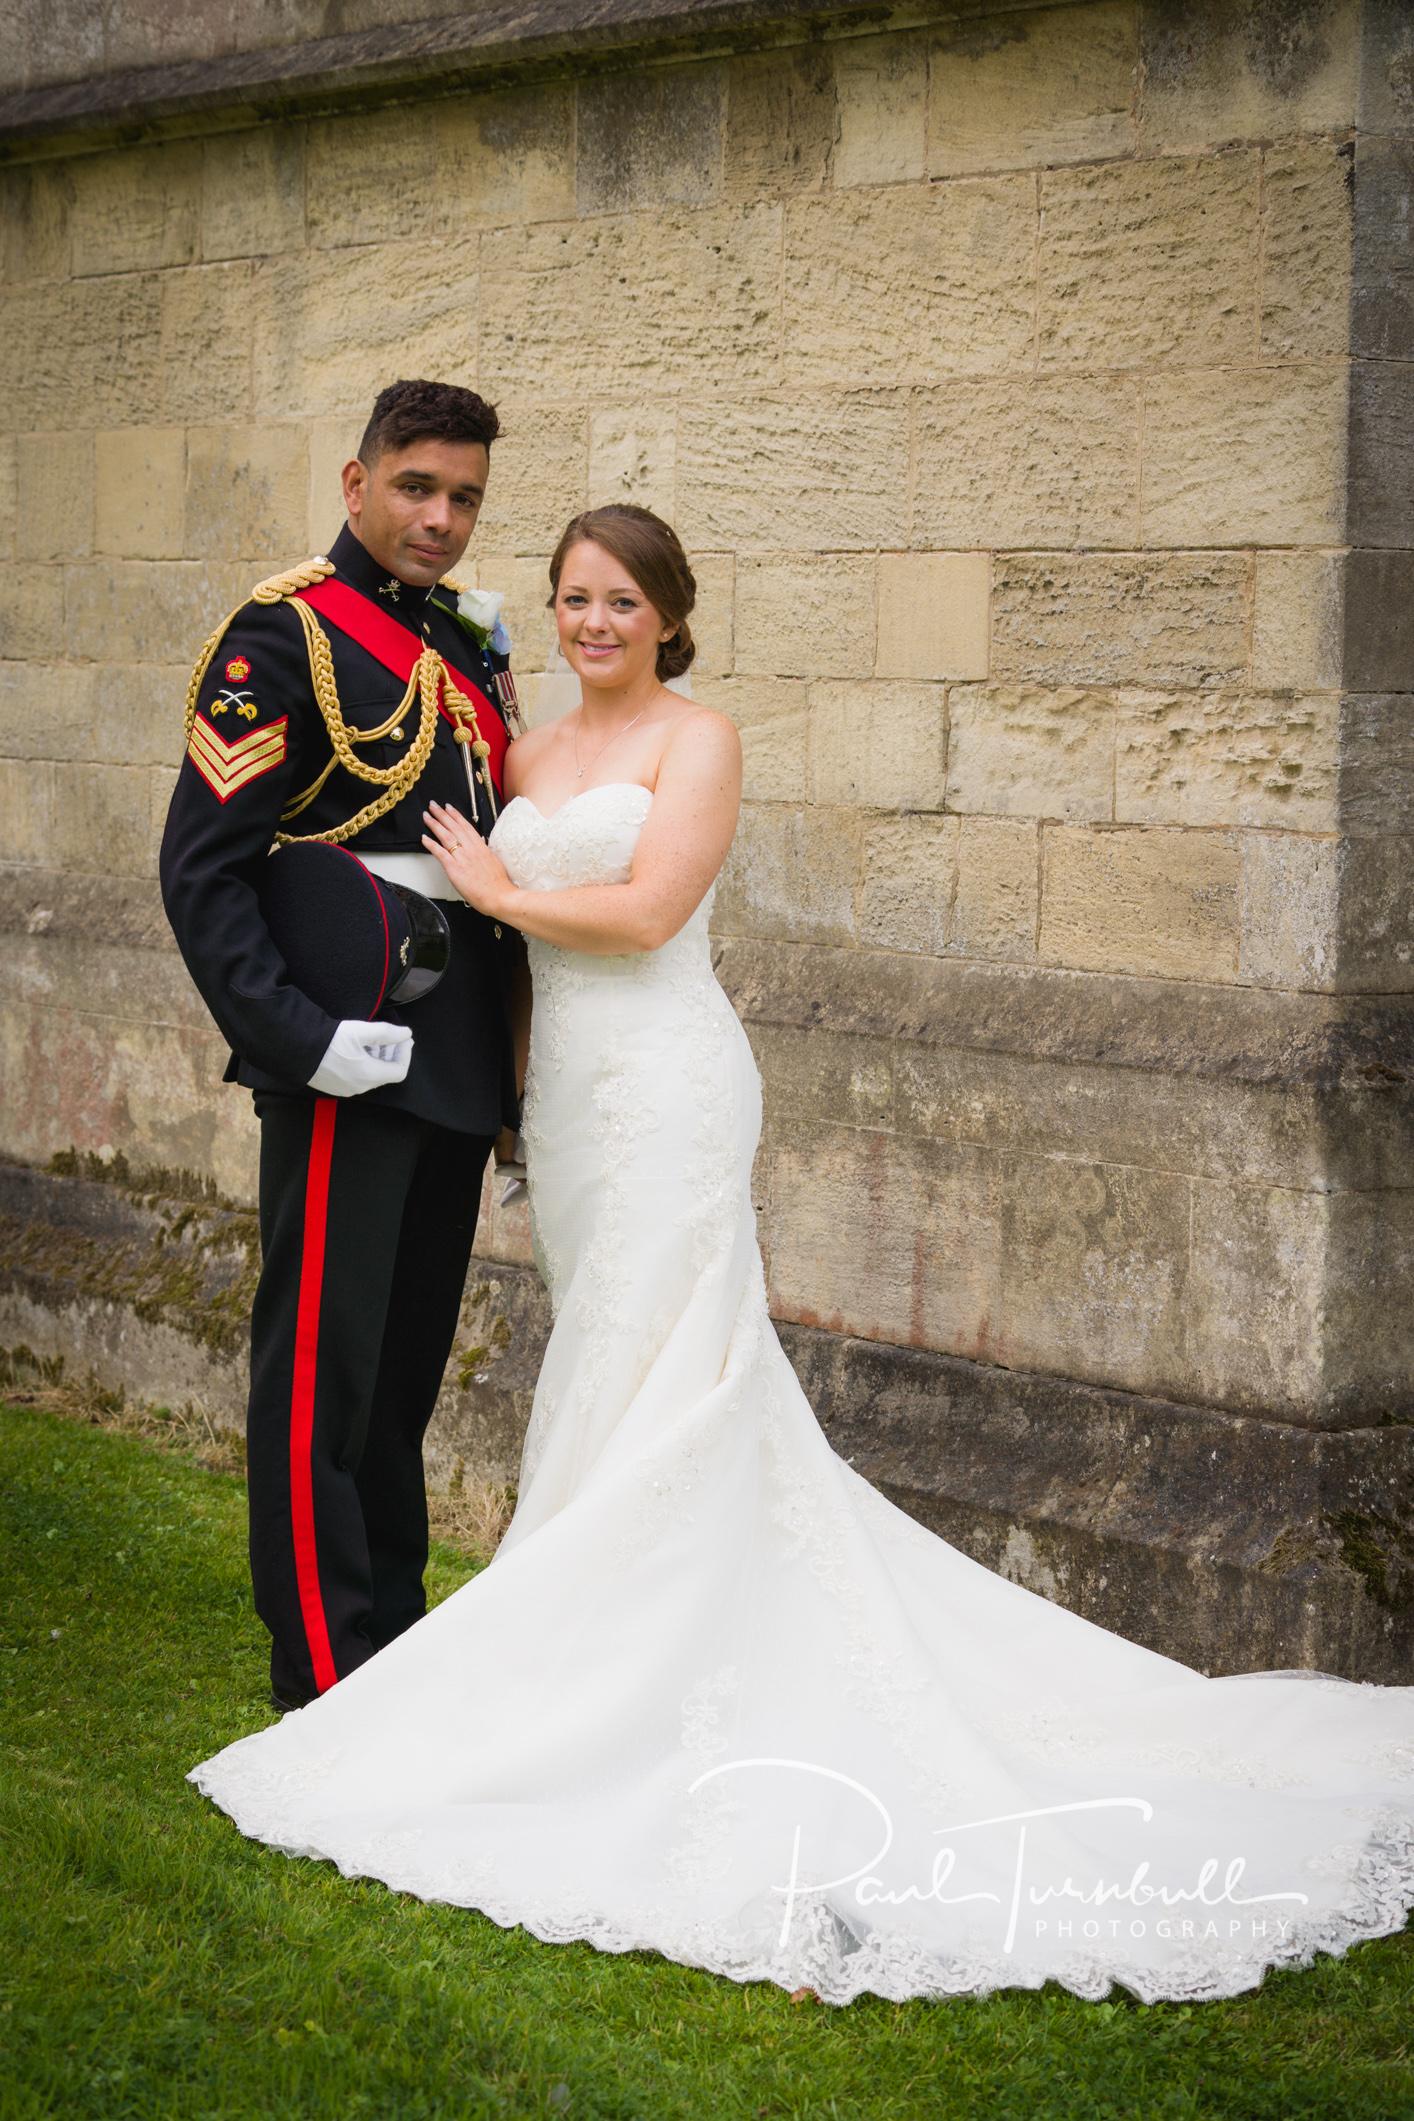 wedding-photographer-south-dalton-walkington-yorkshire-emma-james-046.jpg